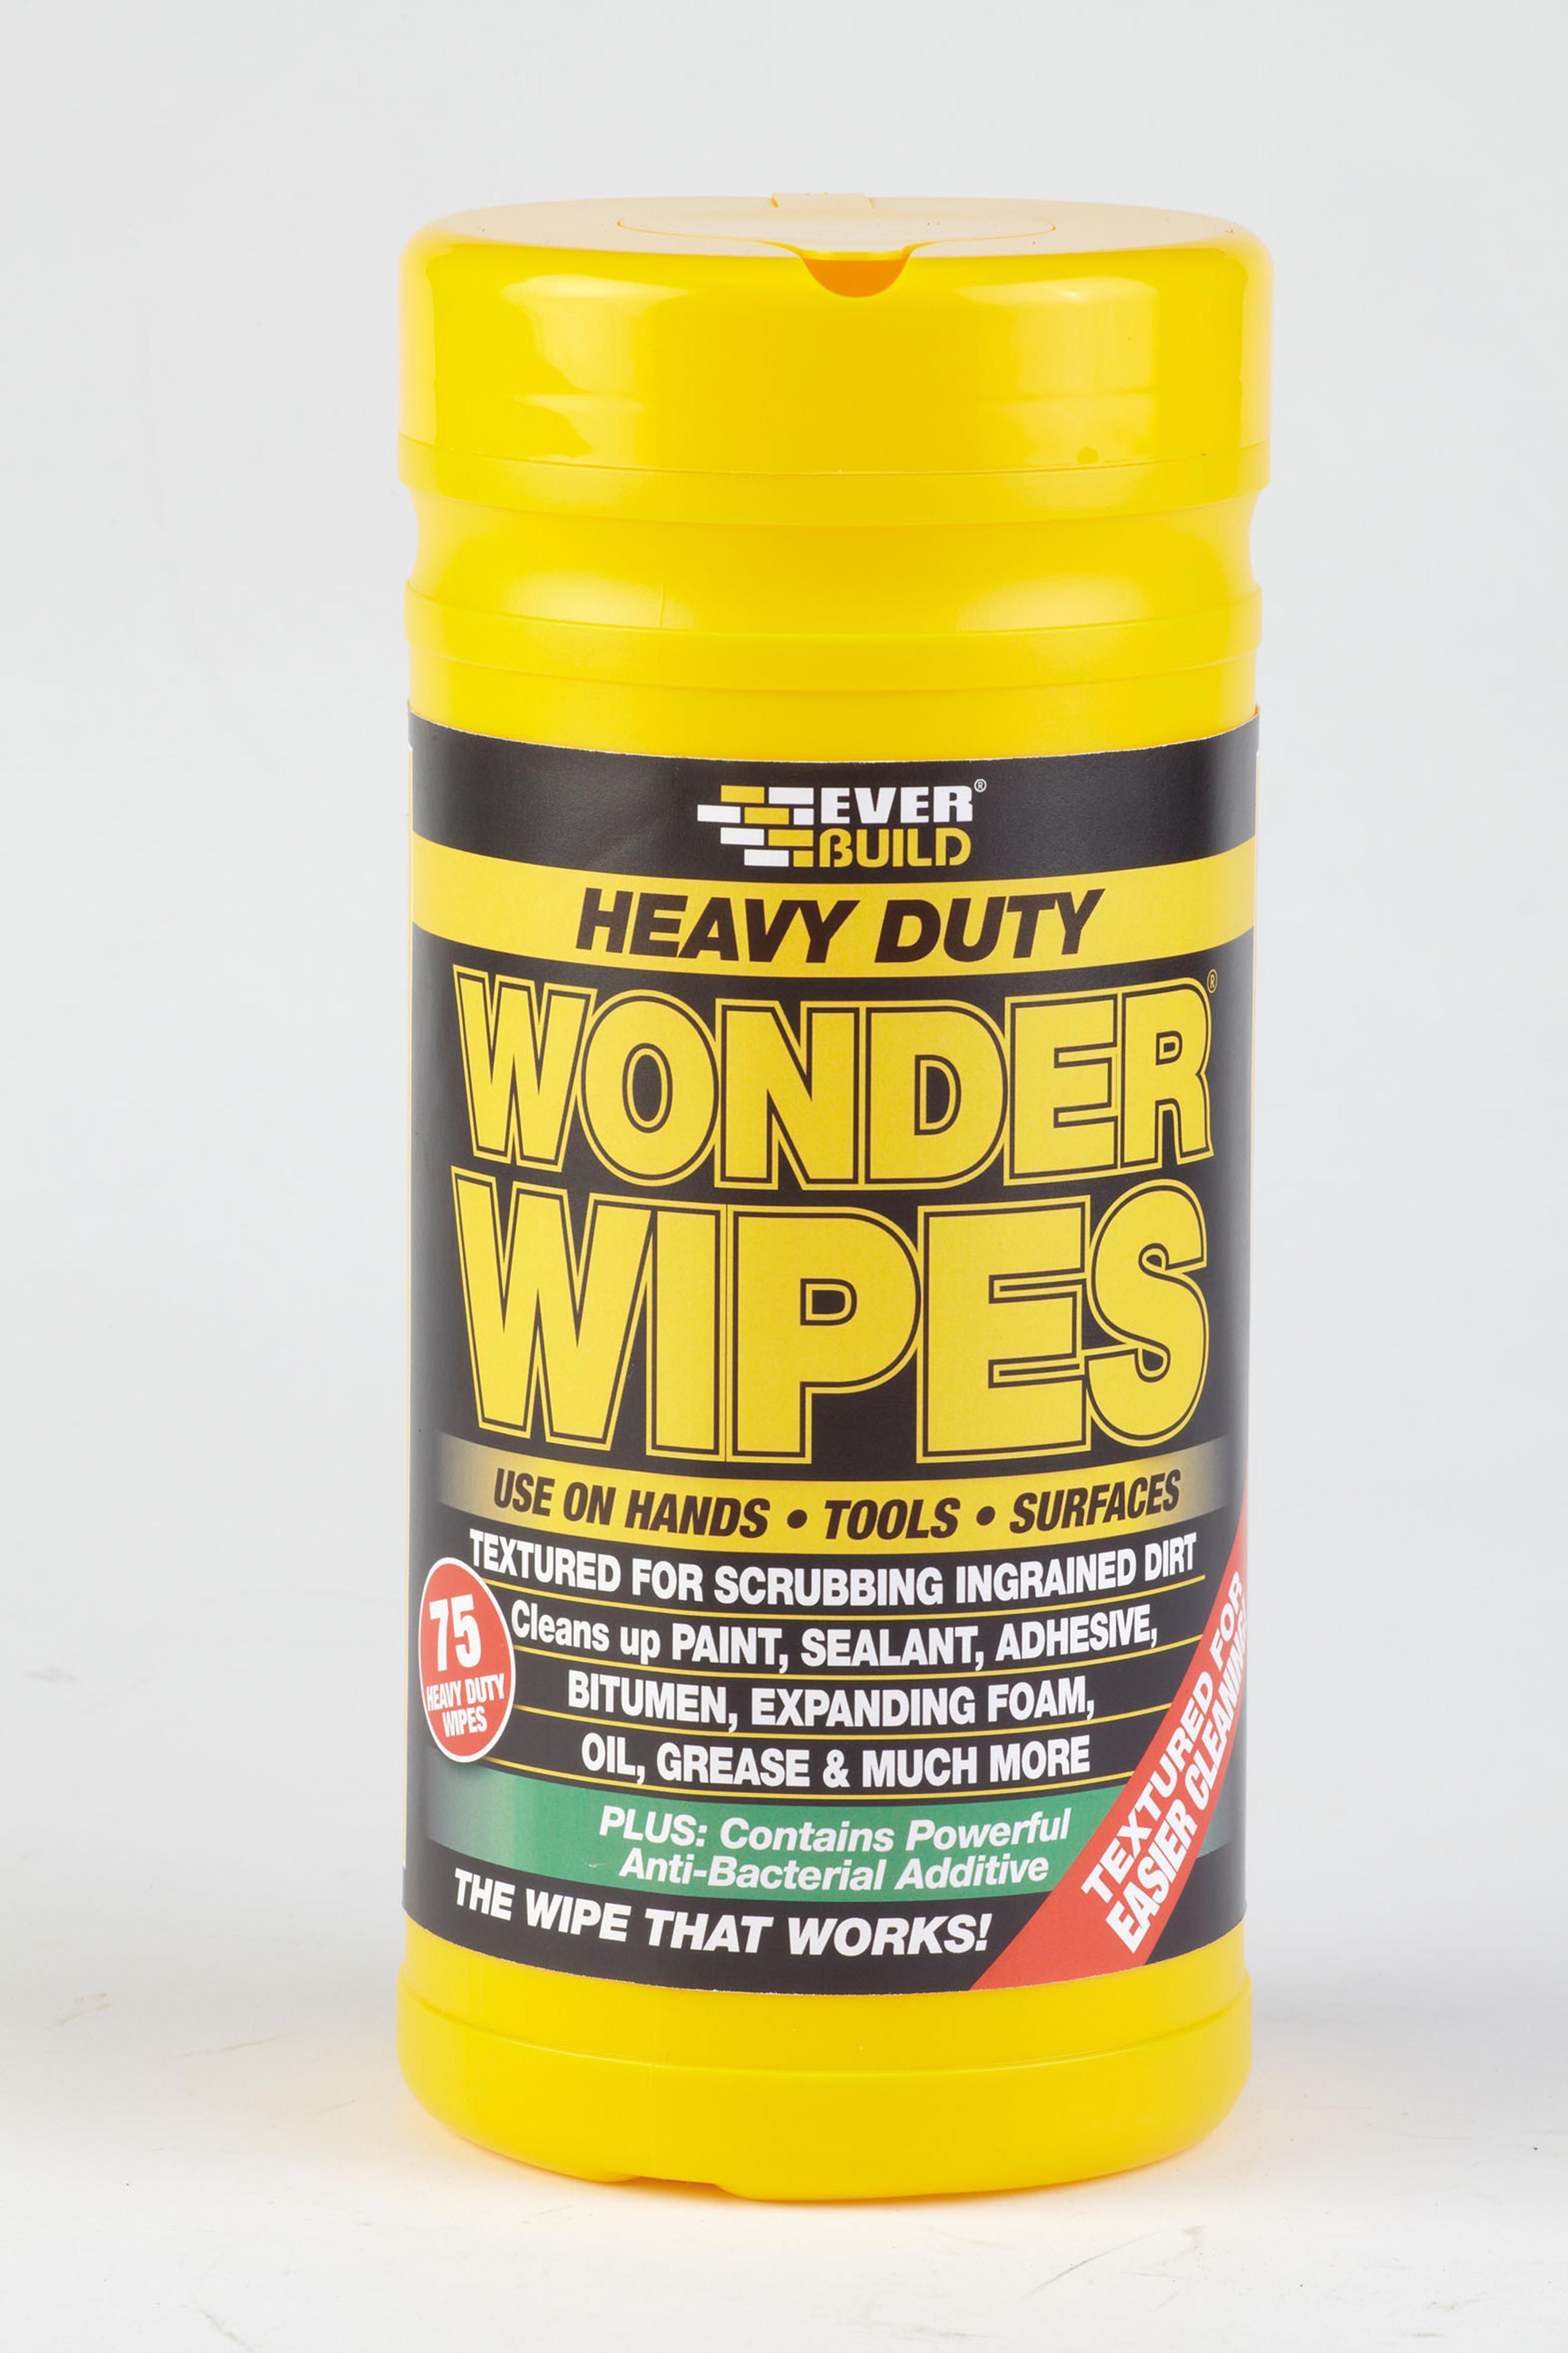 Heavy Duty Wonder Wipes Construction Sealants Limited